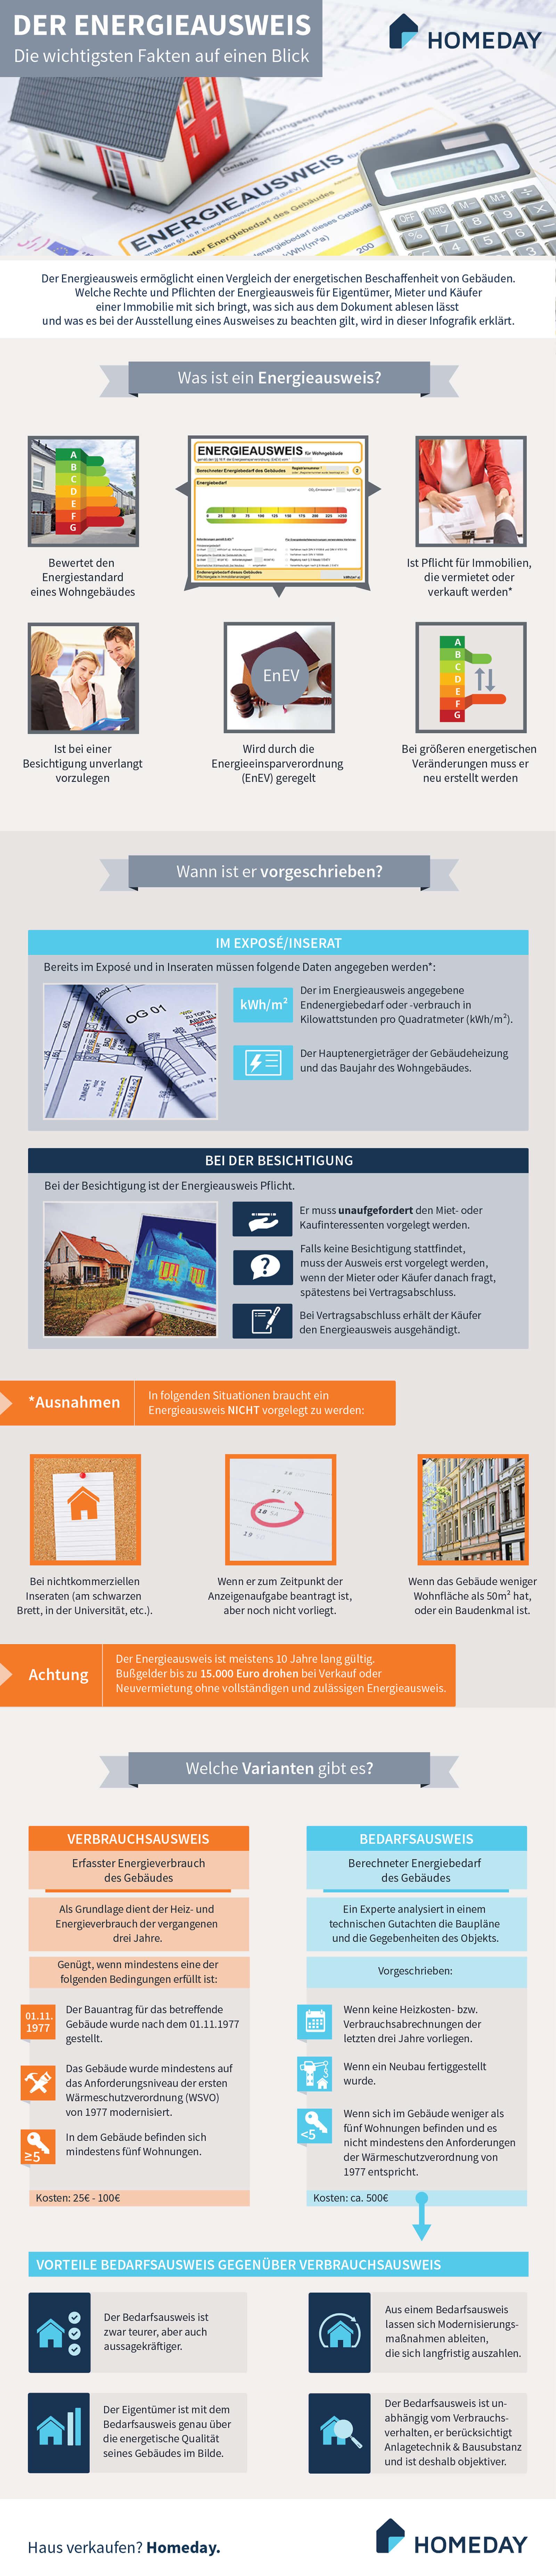 energieausweis-infografik